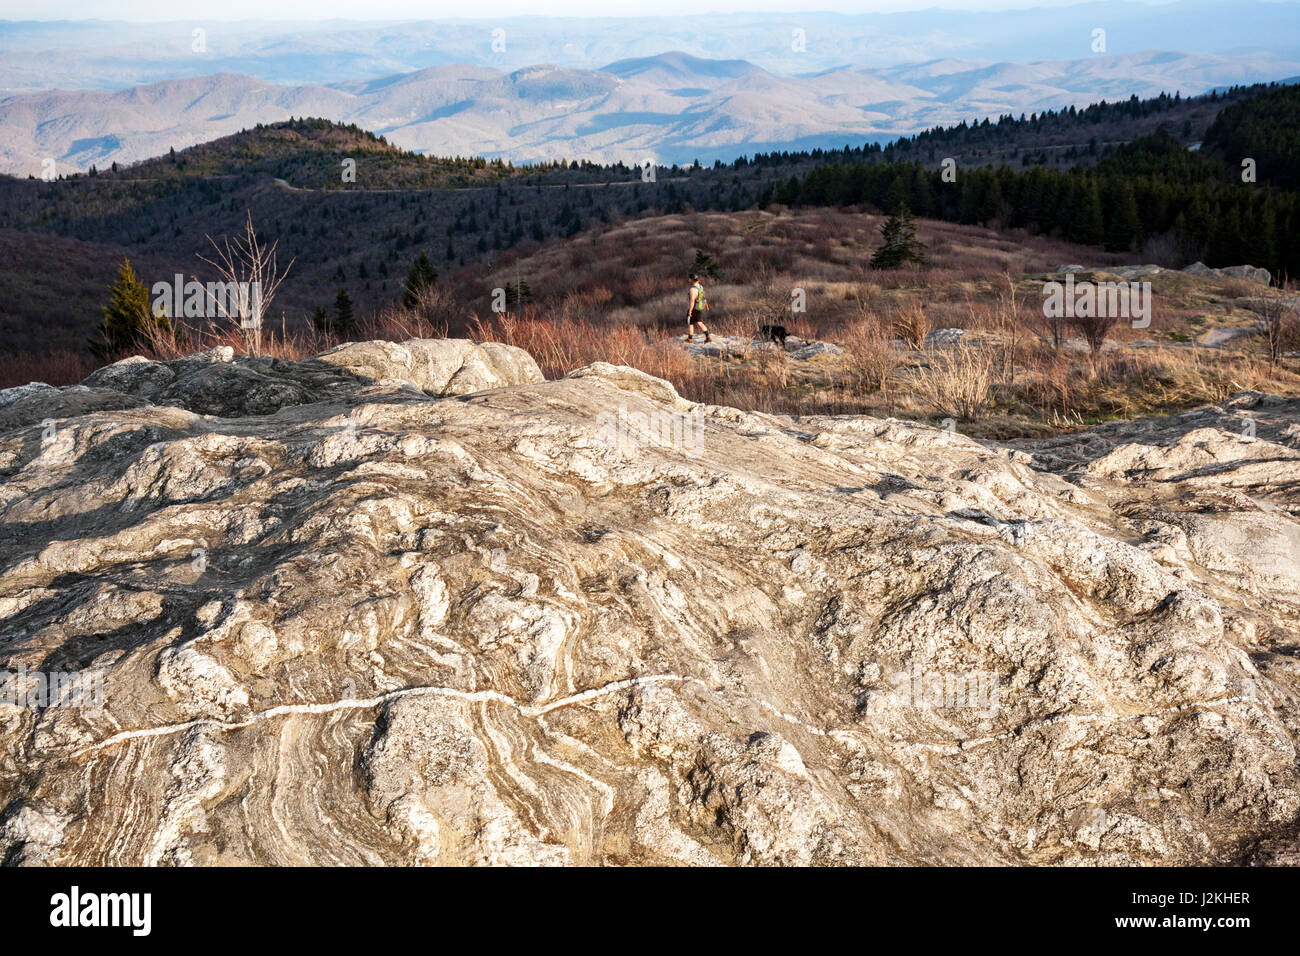 Rock patterns on Art Loeb Trail near Black Balsam Knob - Blue Ridge Parkway, North Carolina, USA - Stock Image